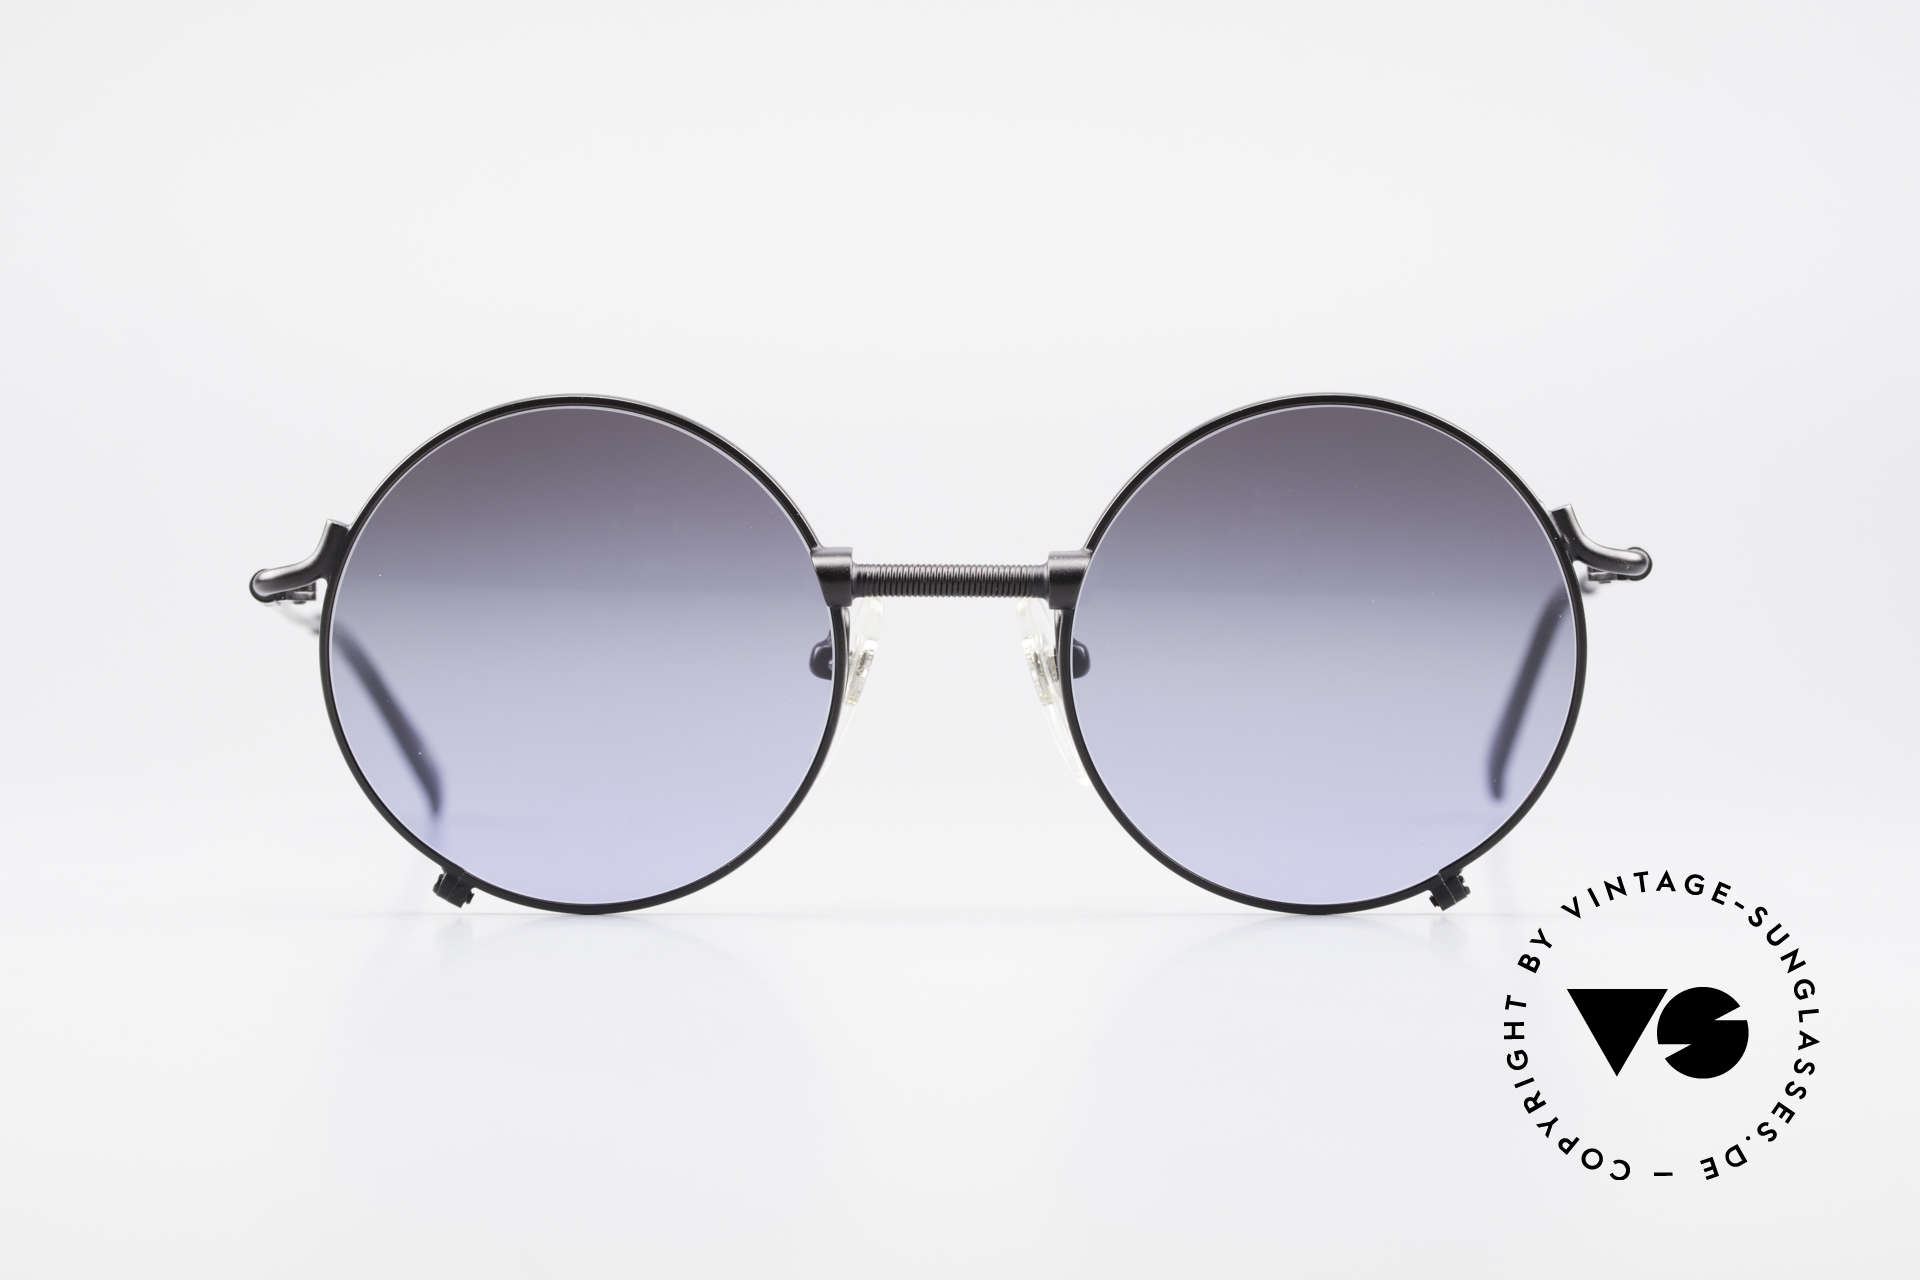 55 Jean Round Sunglasses Gaultier Vintage Paul 7162 vnmNOyw80P